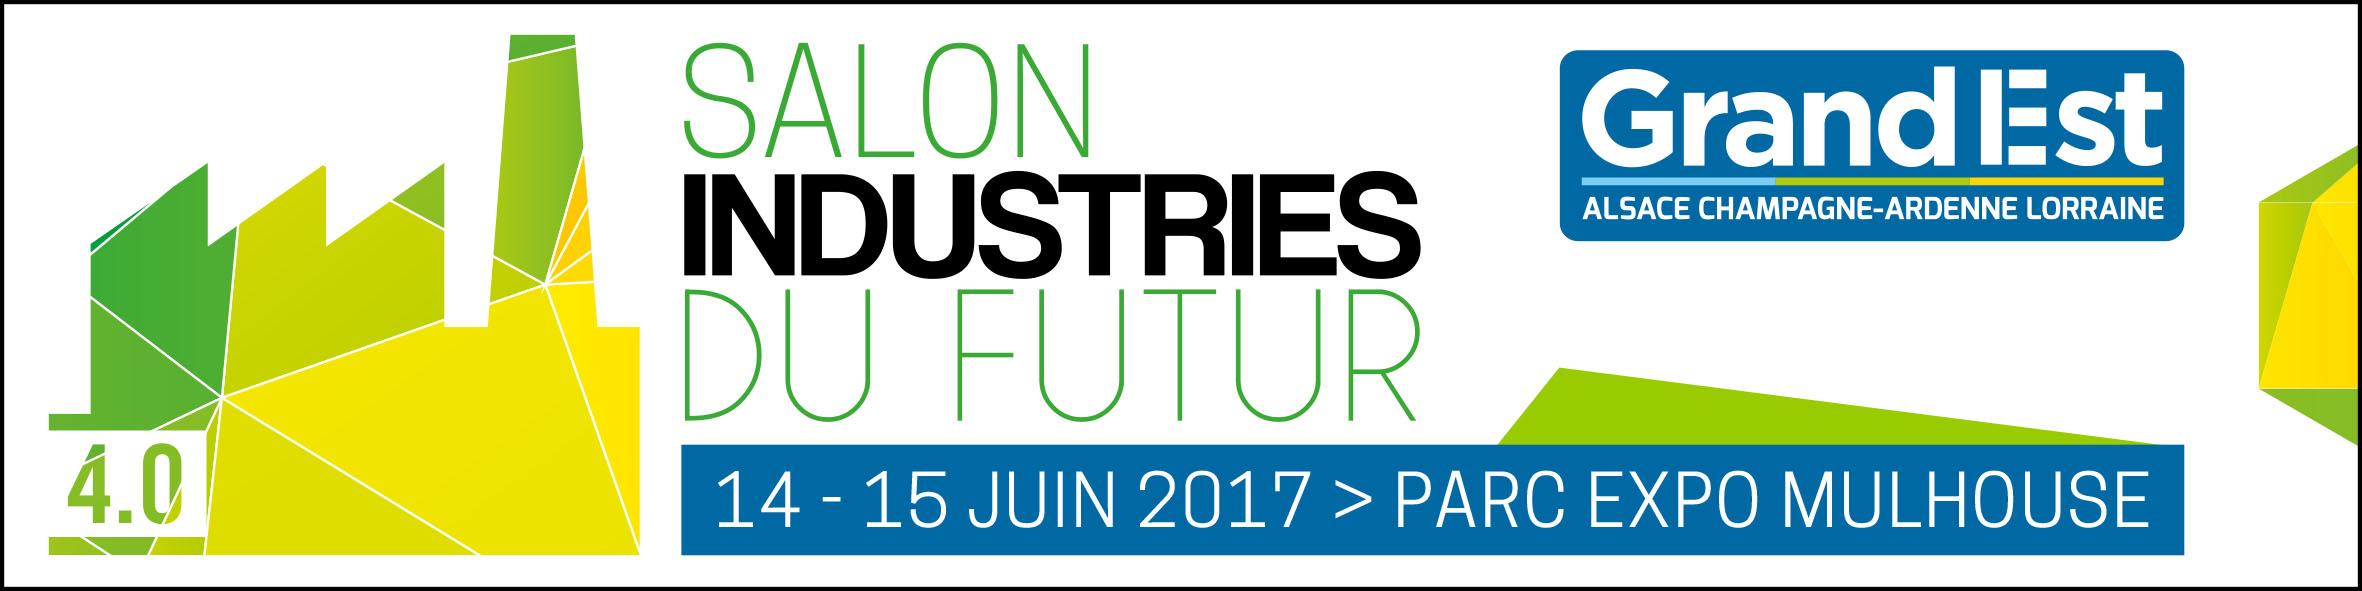 Salon-Industries-Futur-2017